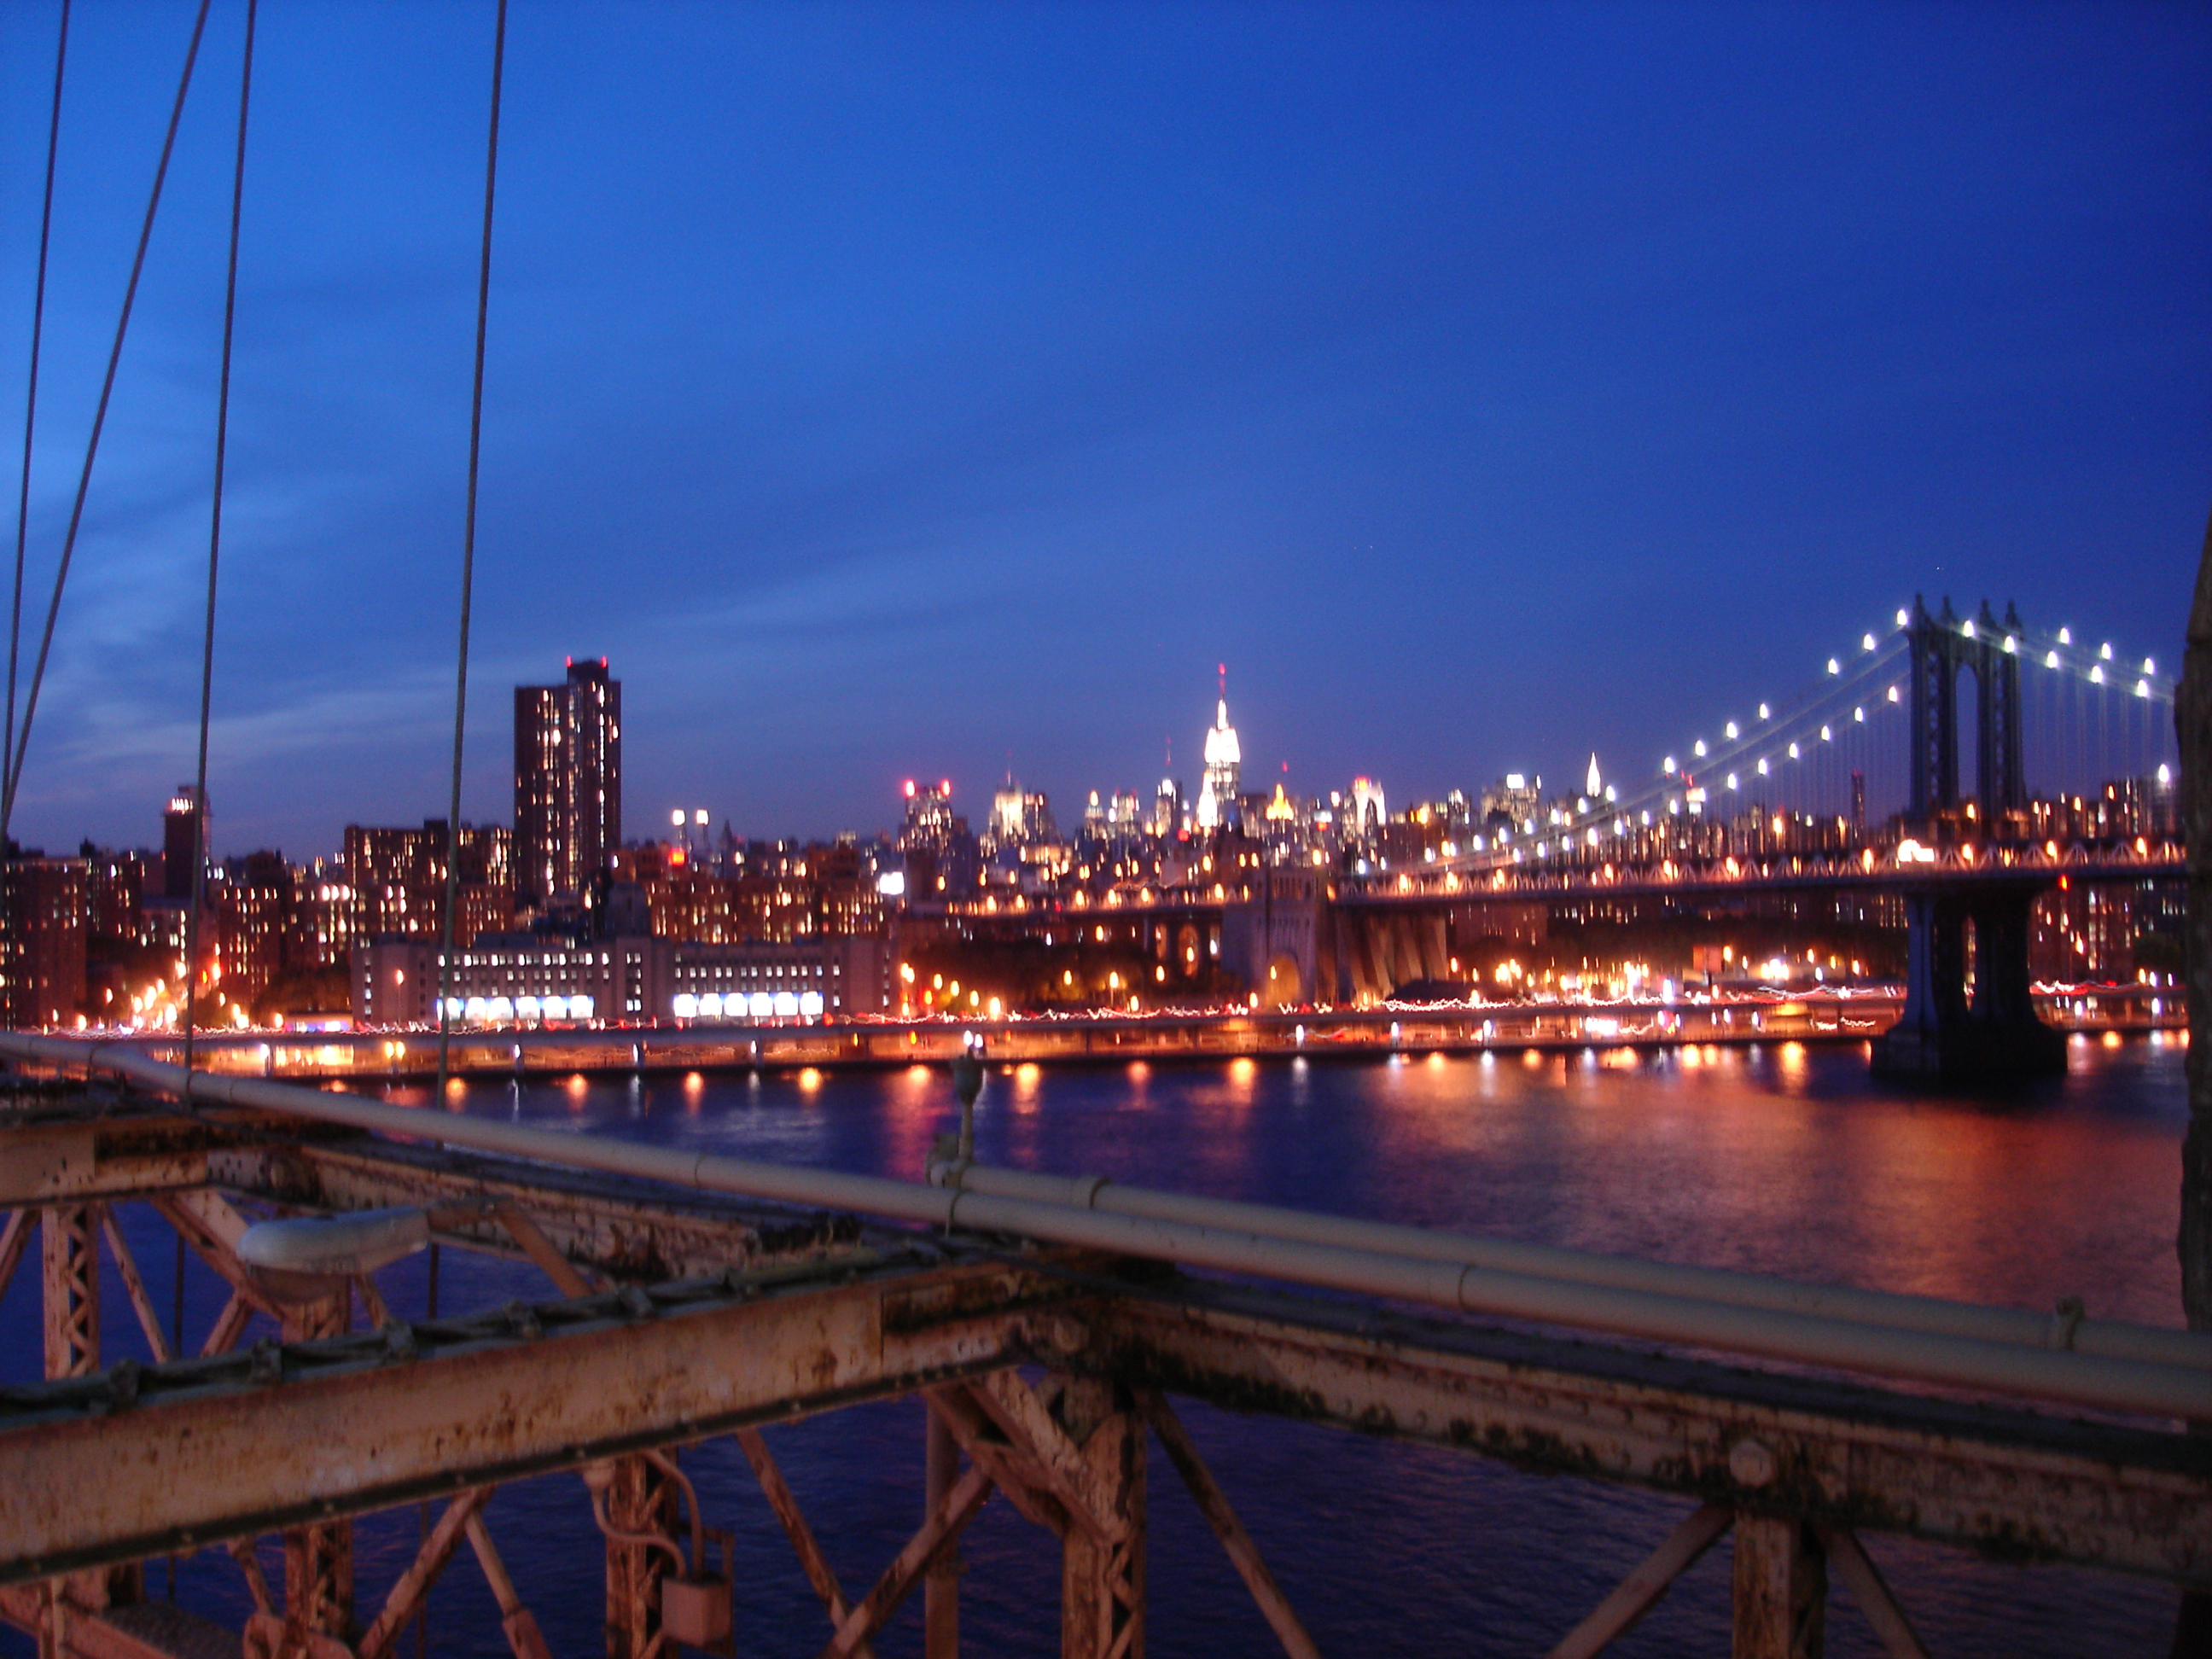 Niagara Falls At Night Wallpaper File Night View At Brooklyn Bridge In New York City